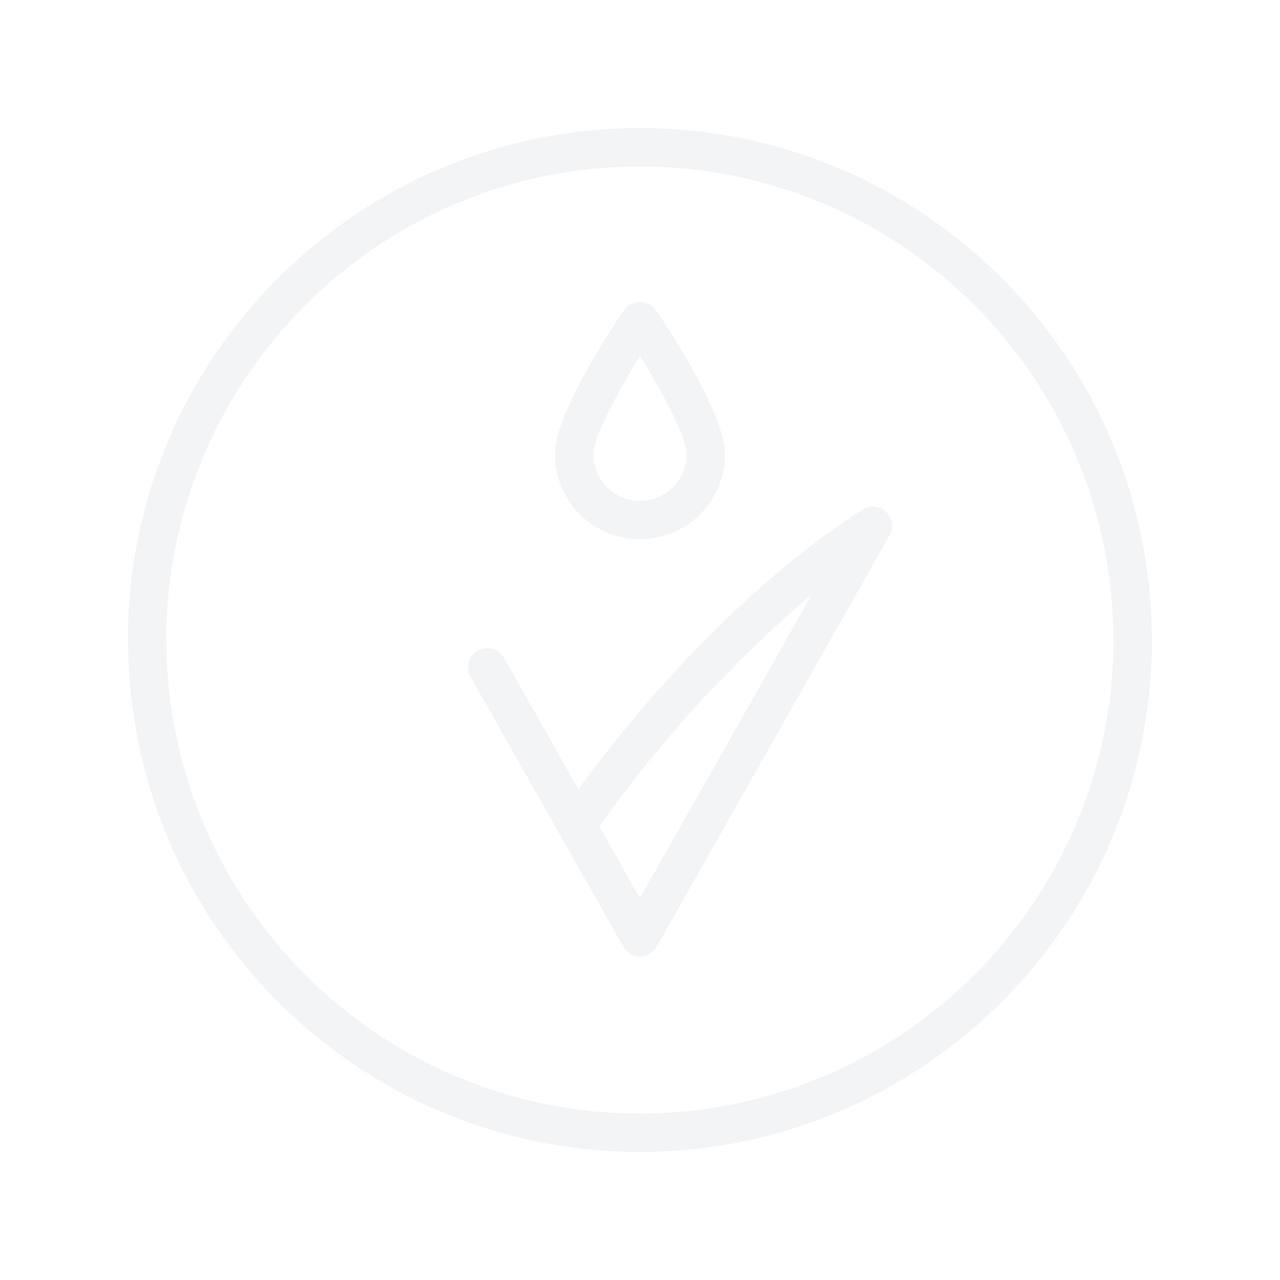 MAYBELLINE Color Sensational Matte Metallic Lipstick 4g